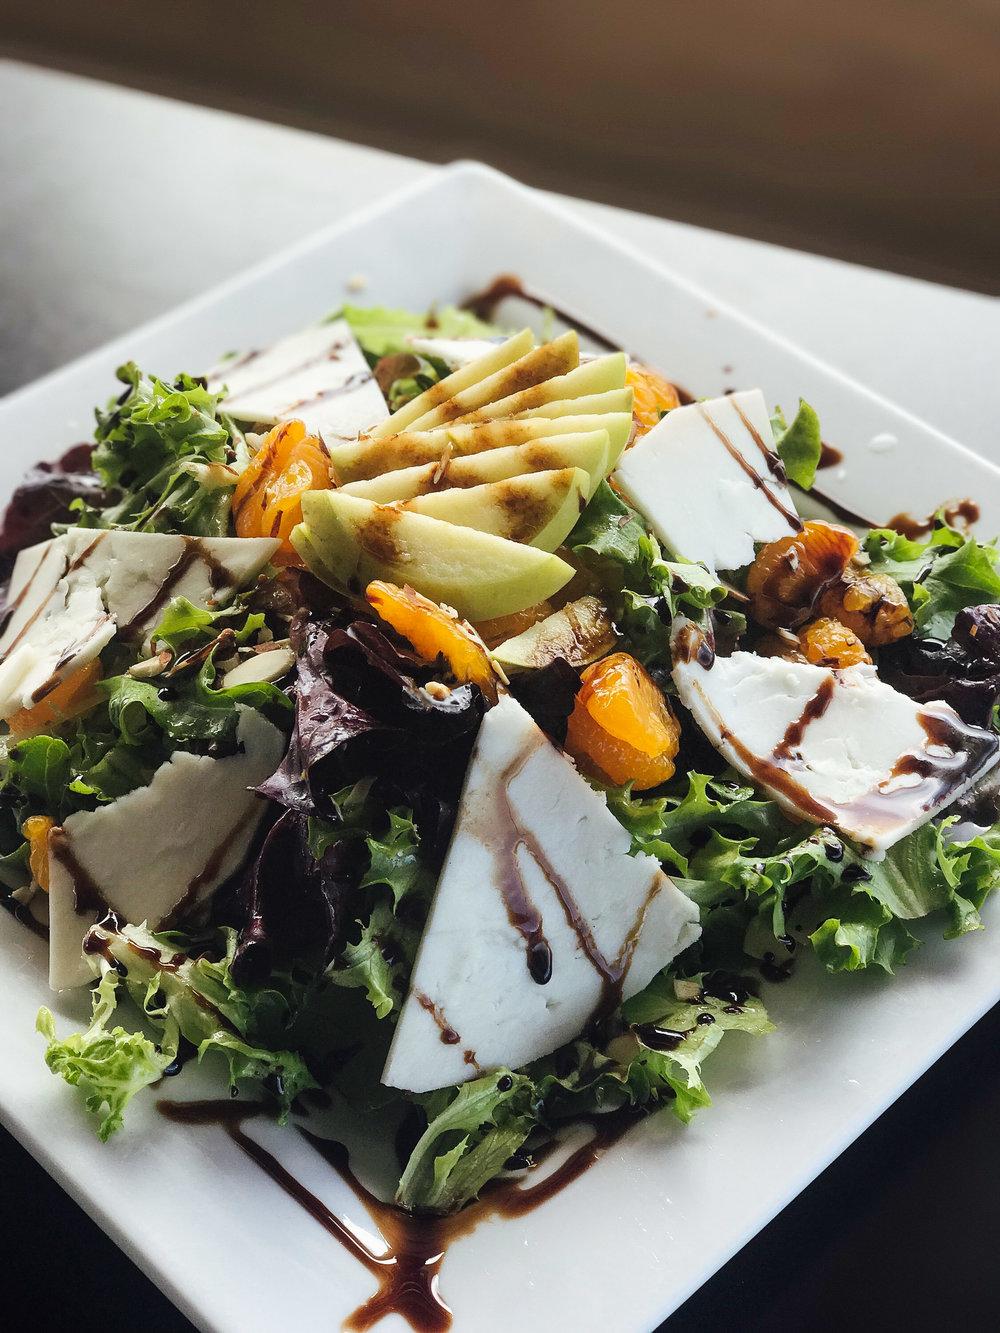 Mama Salad.........$8.75